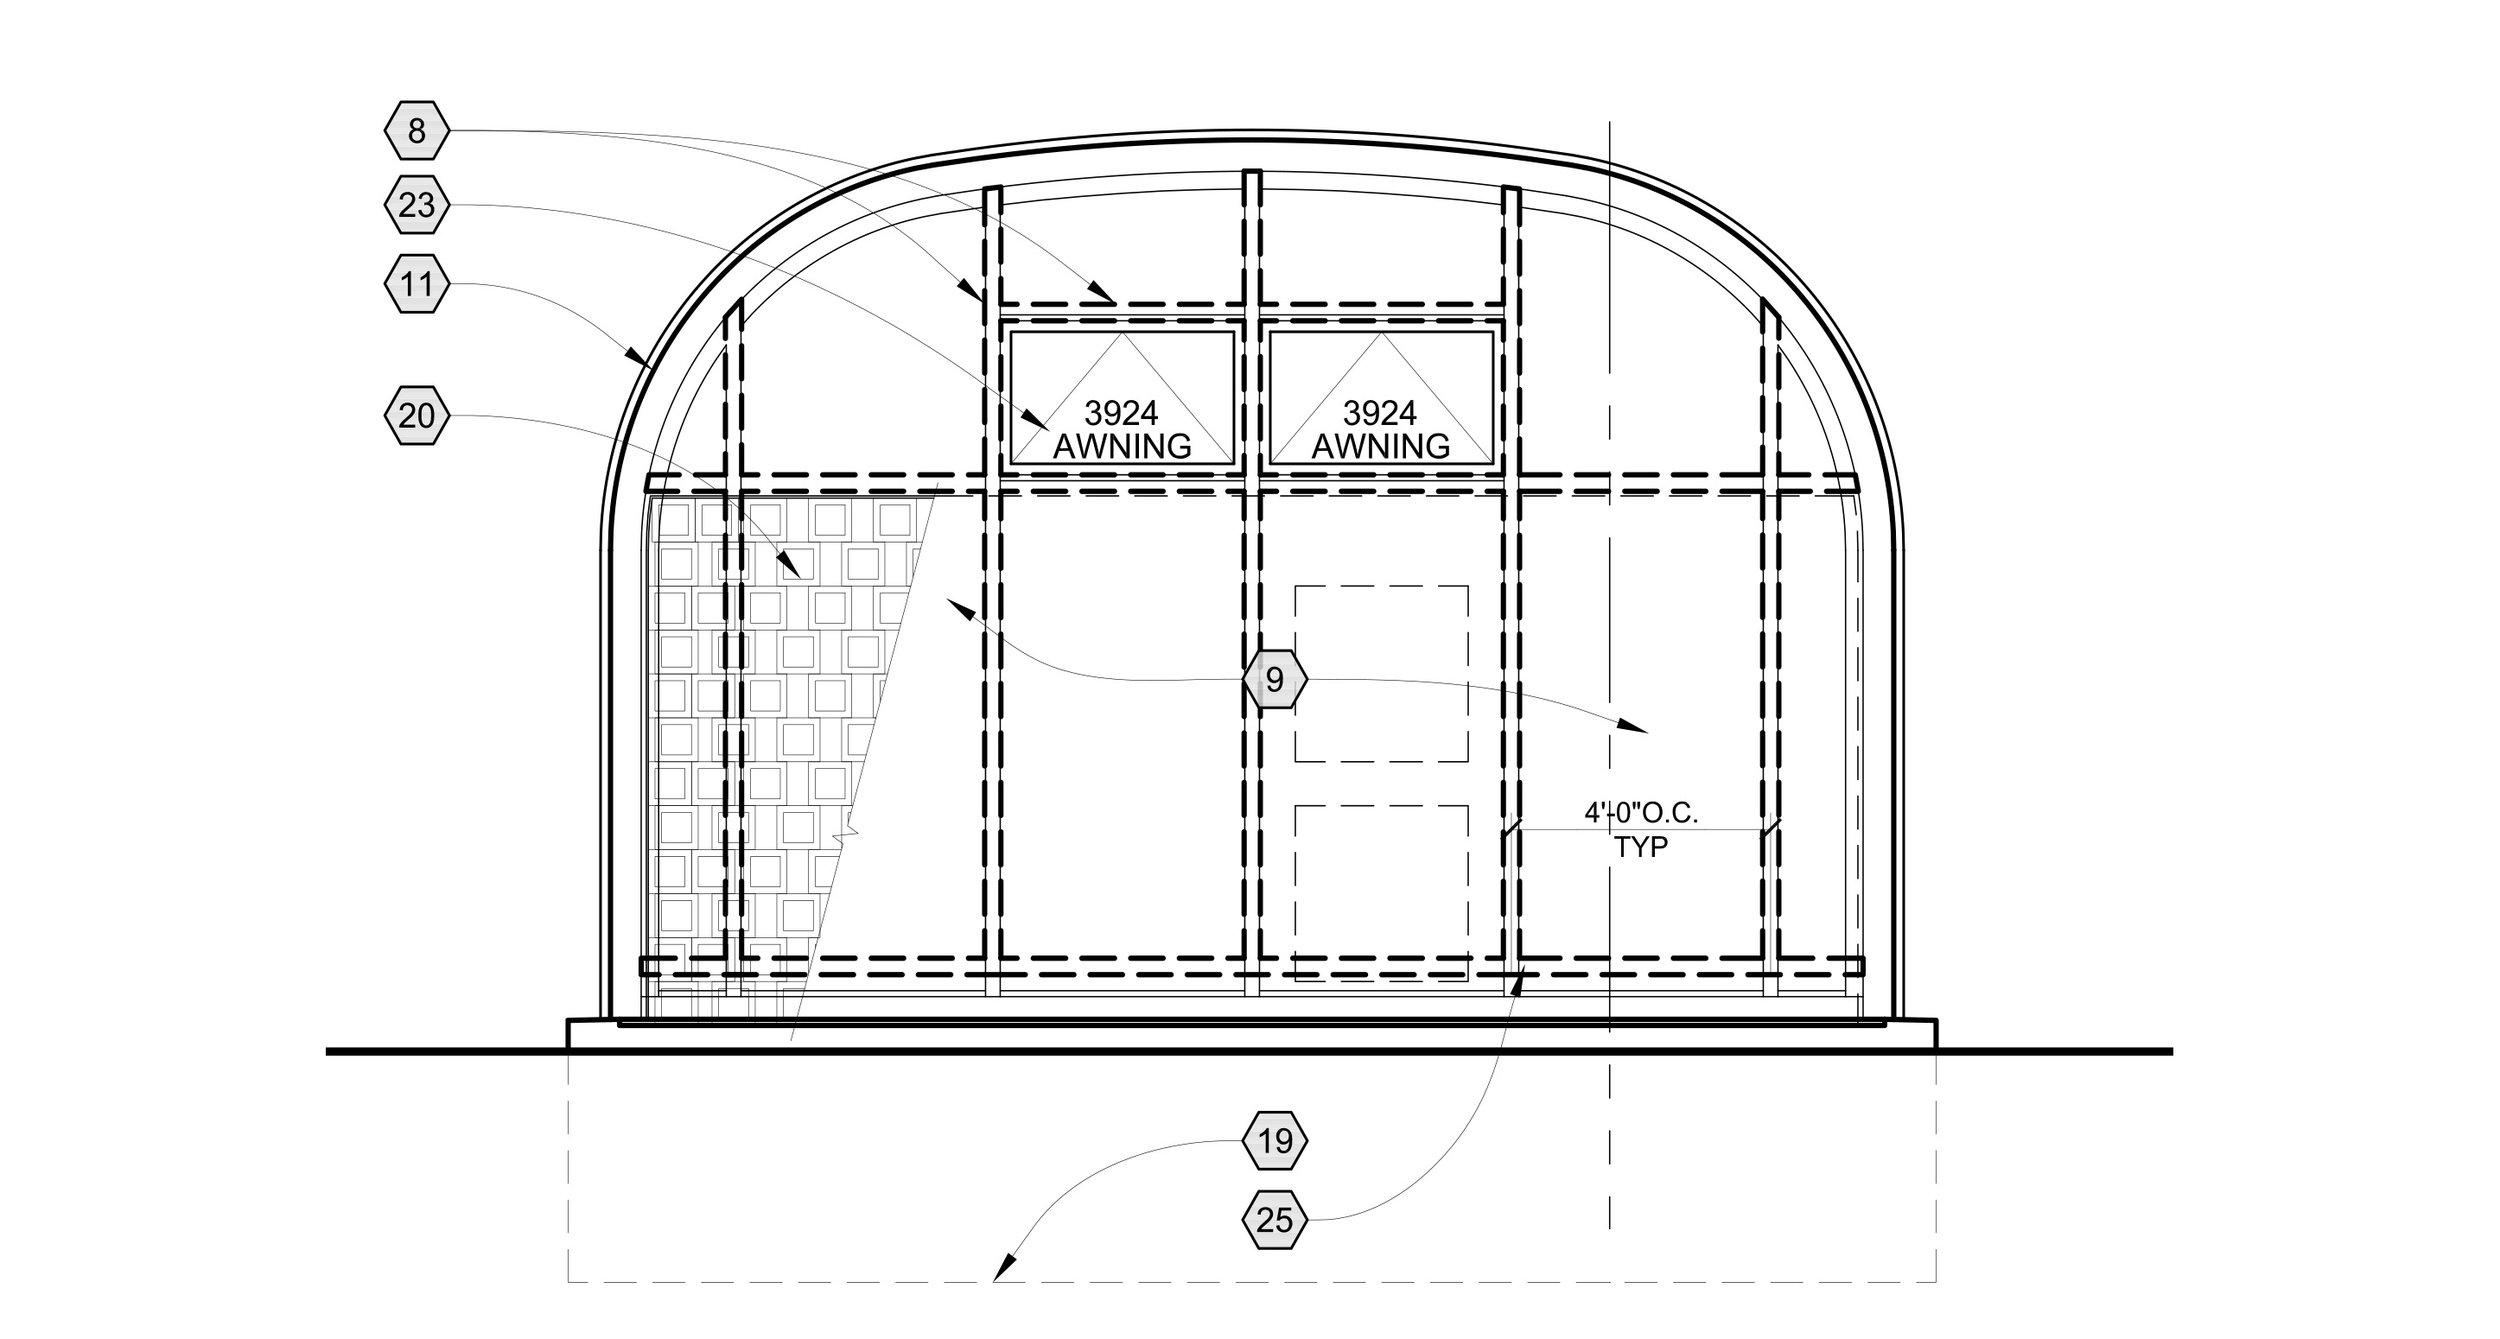 hut_model_s20-13_arch_rendering.jpg